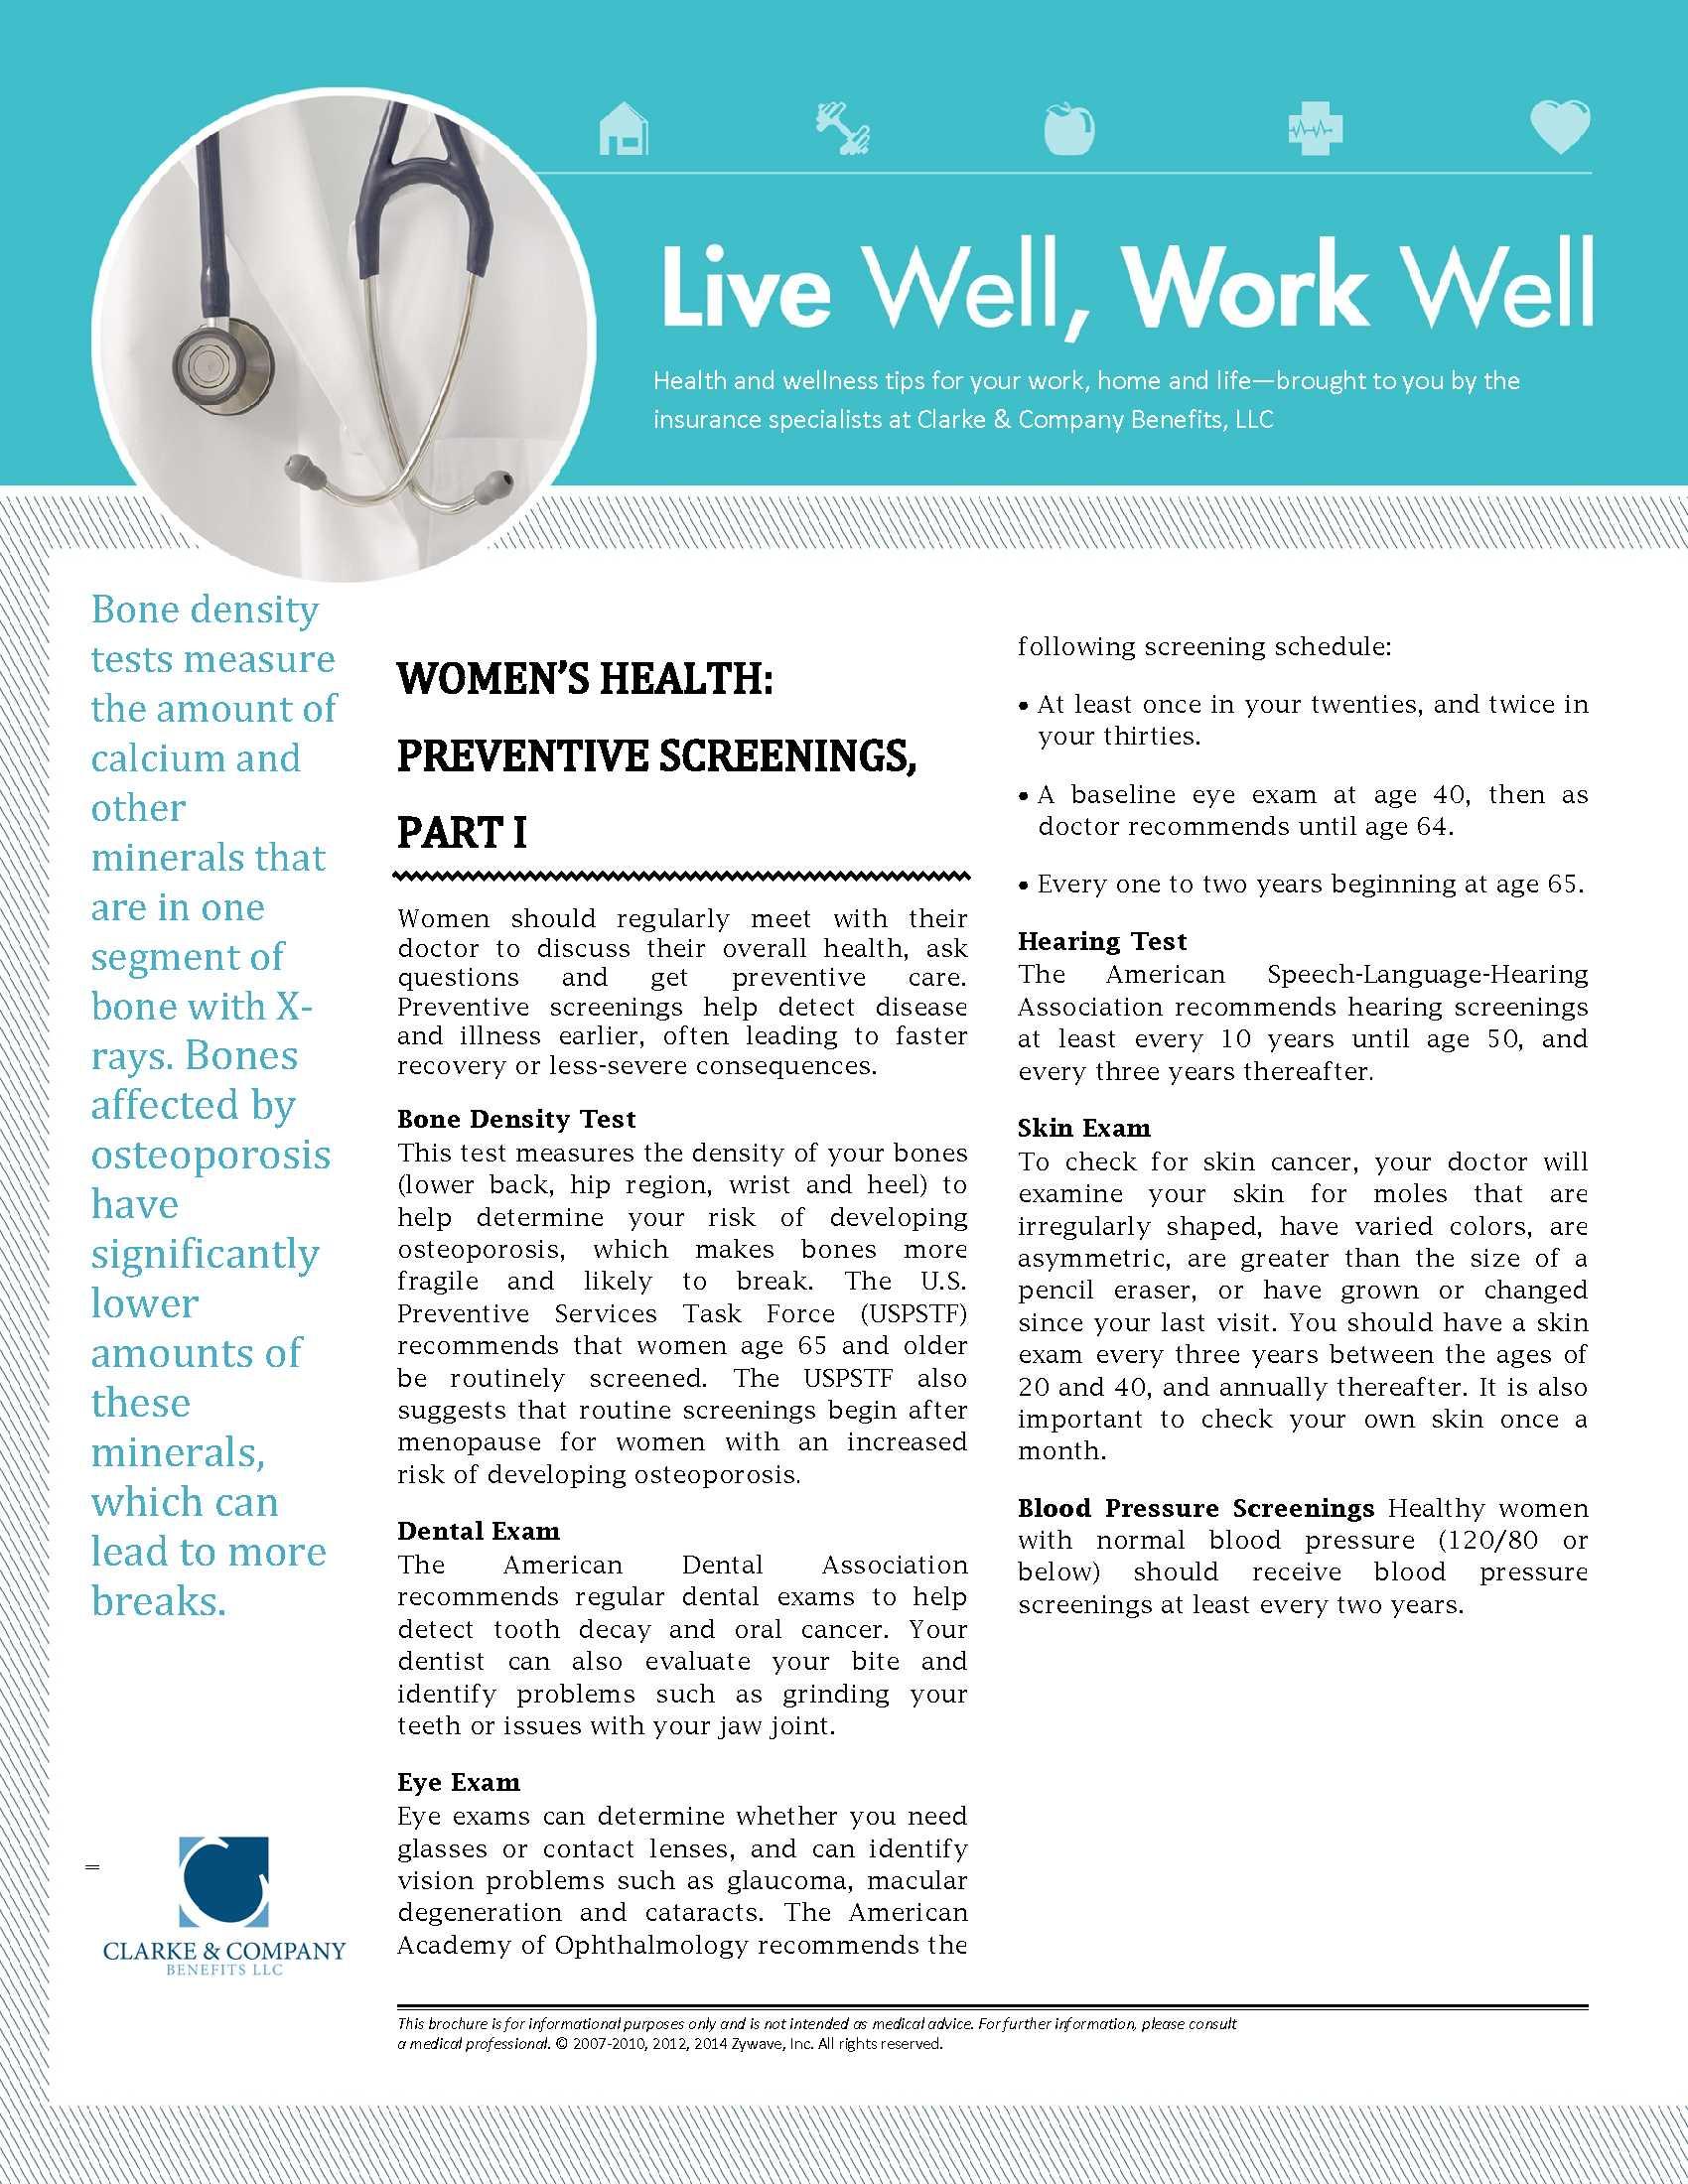 Women's Health - Preventive Screenings - Part I